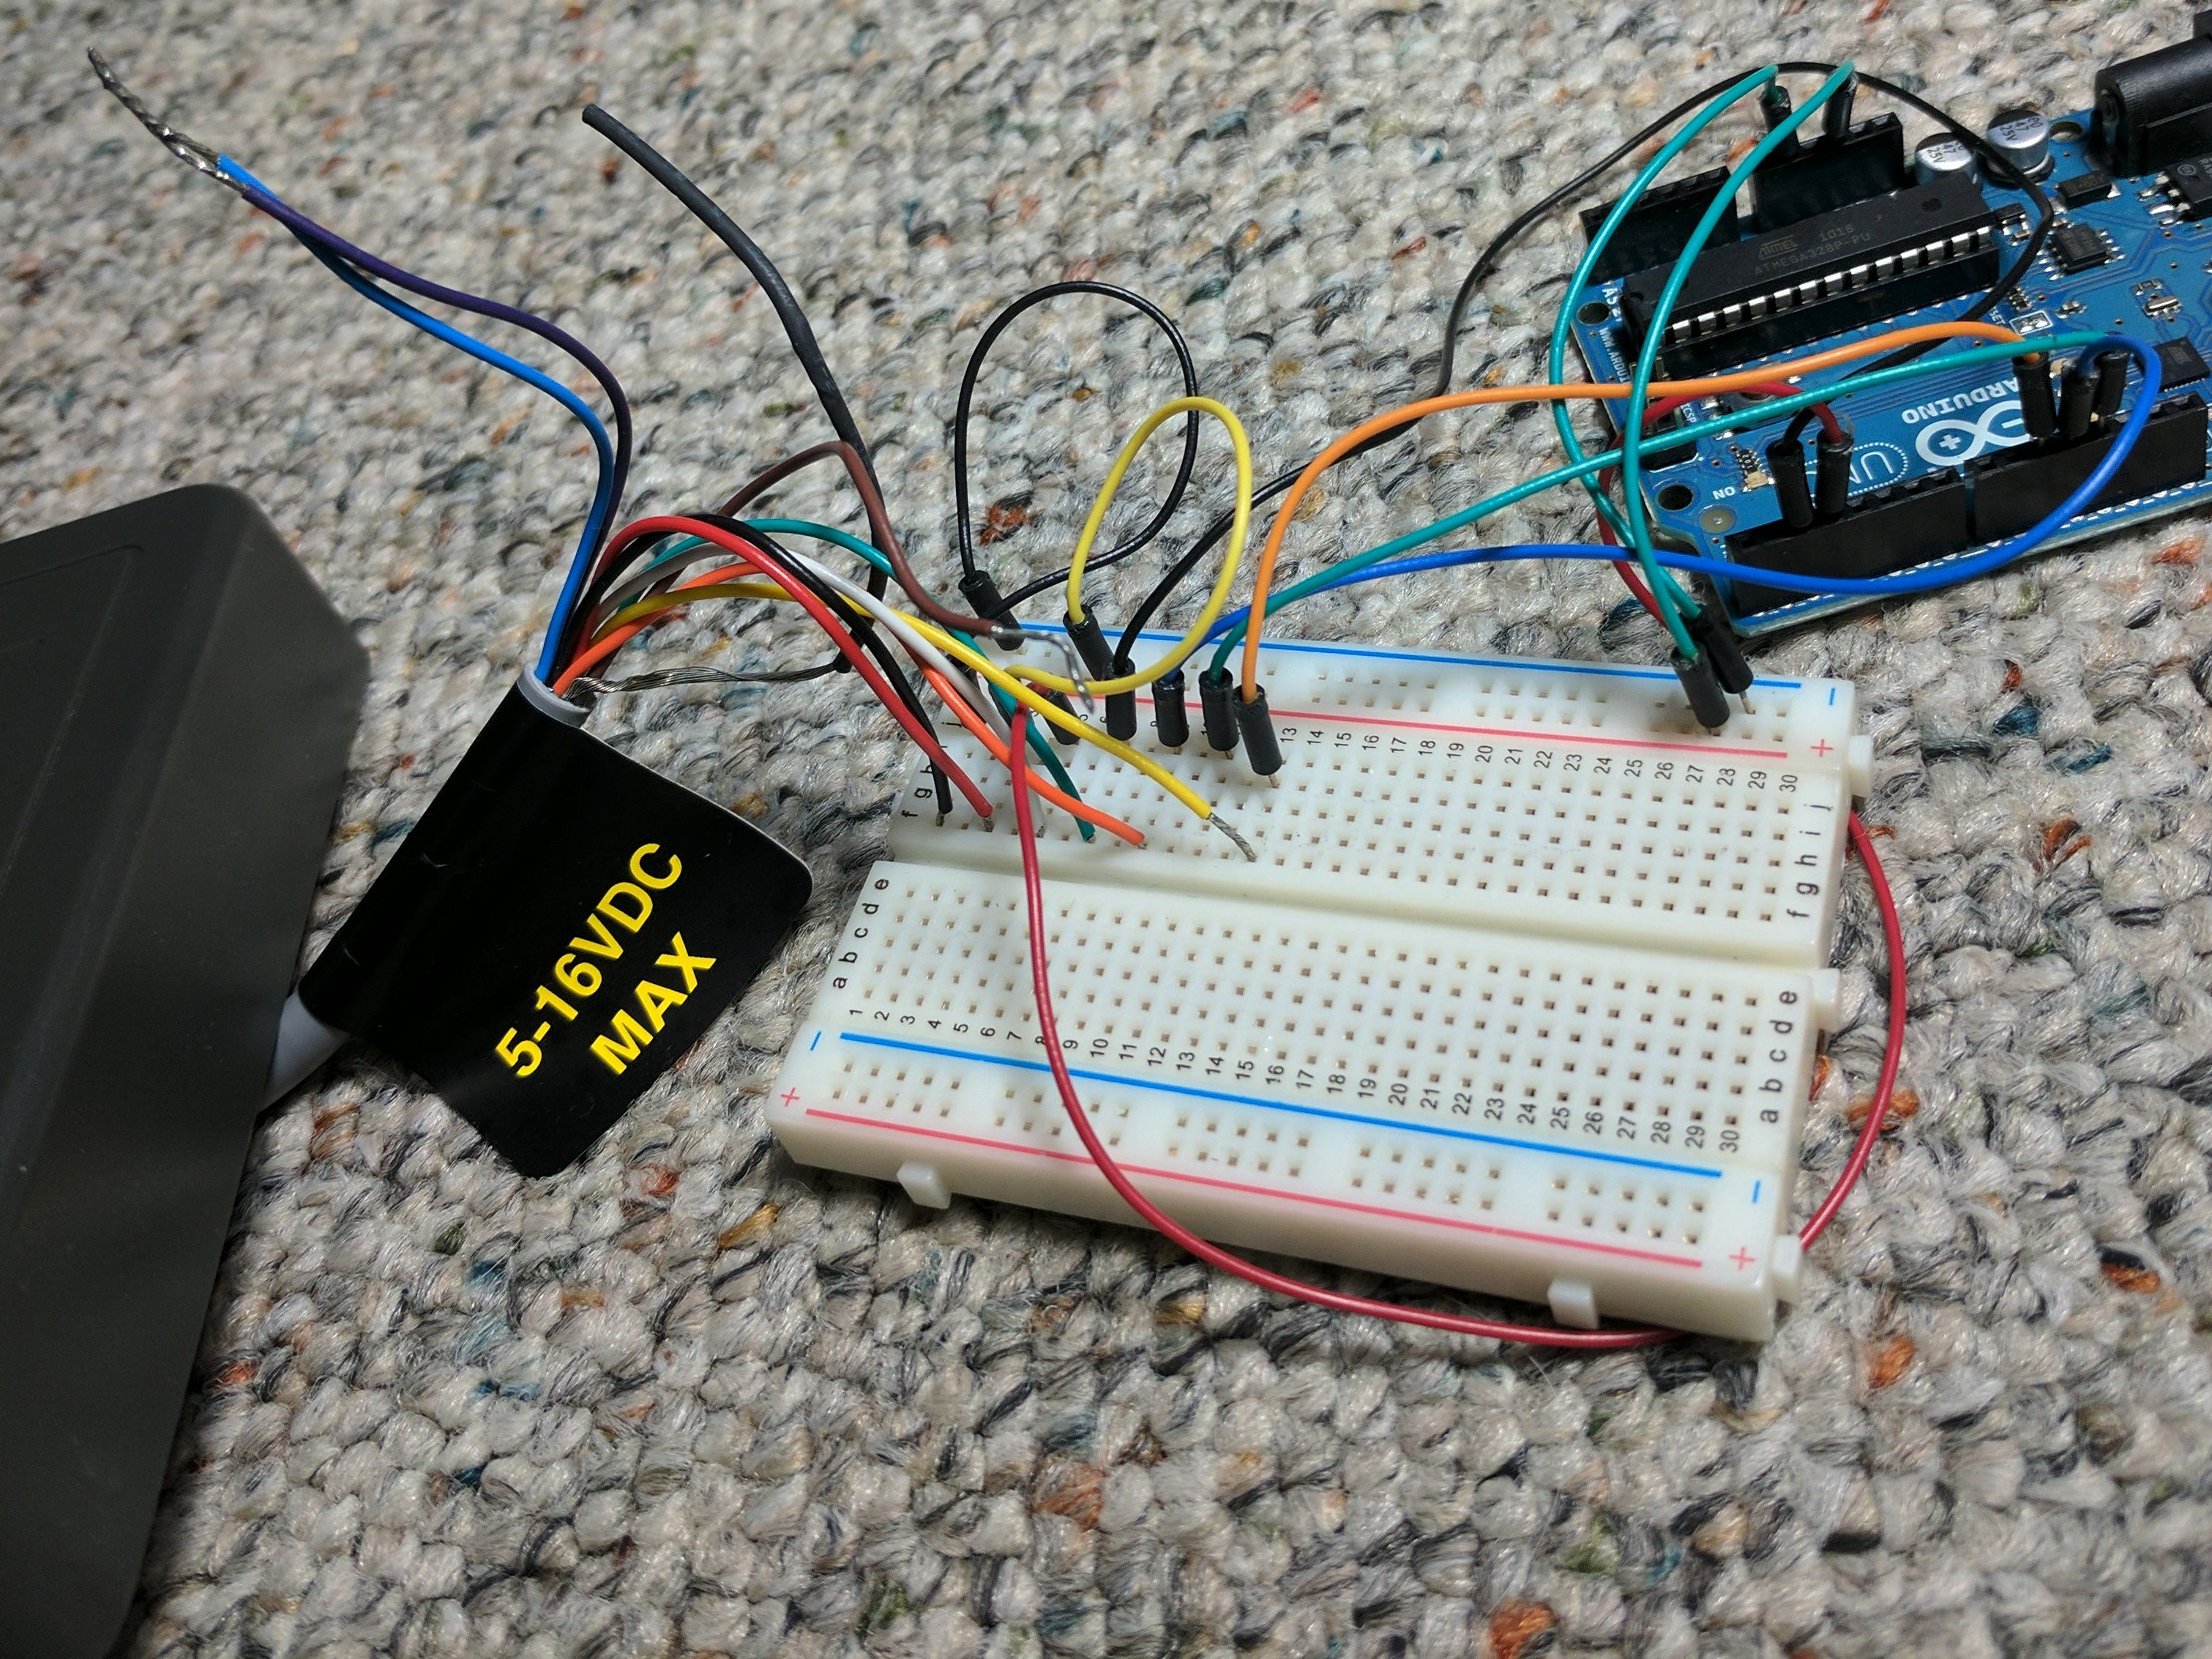 hid miniprox reader wiring diagram motor starters diagrams 5365 32